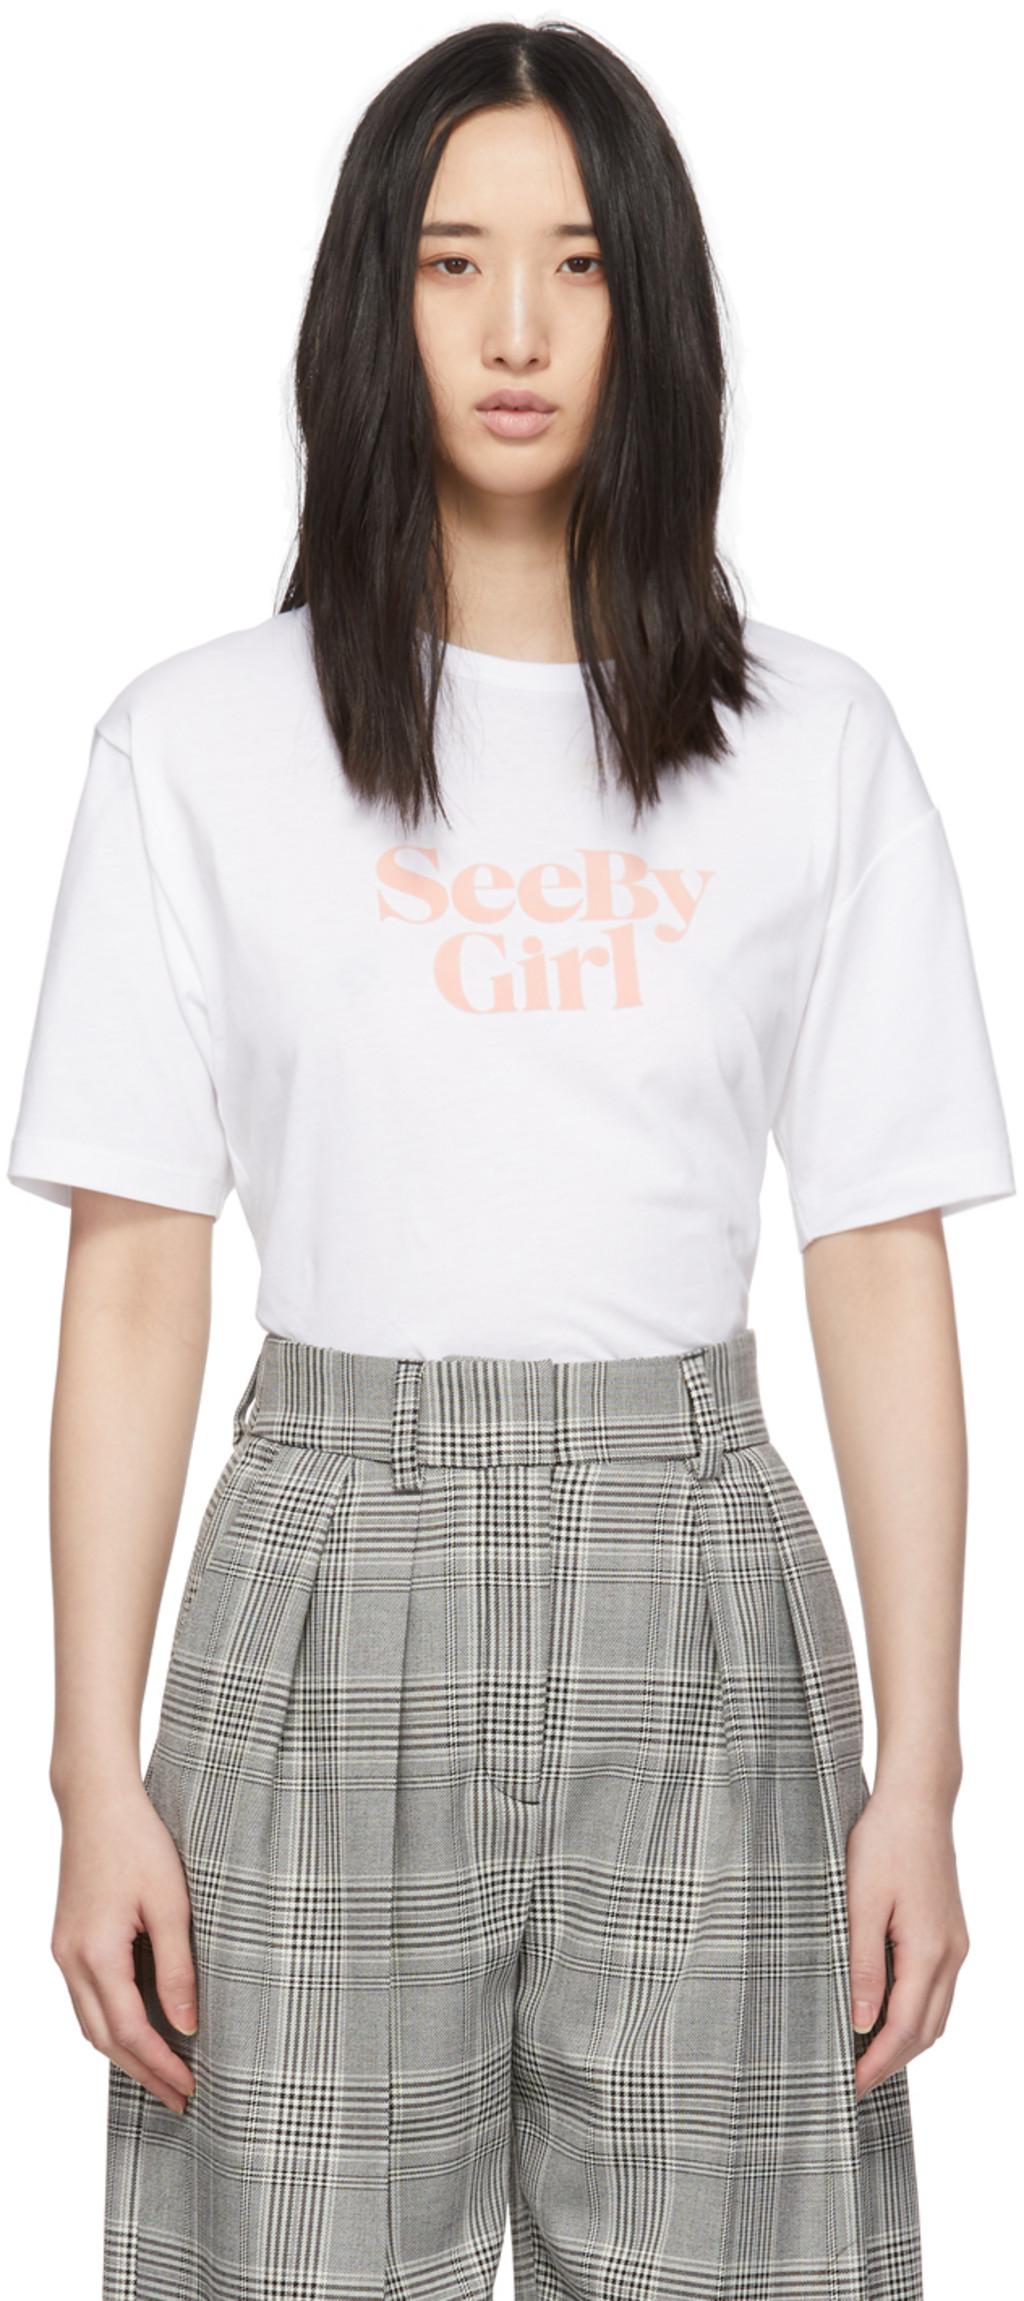 10e17e4425 White 'See By Girl' T-Shirt